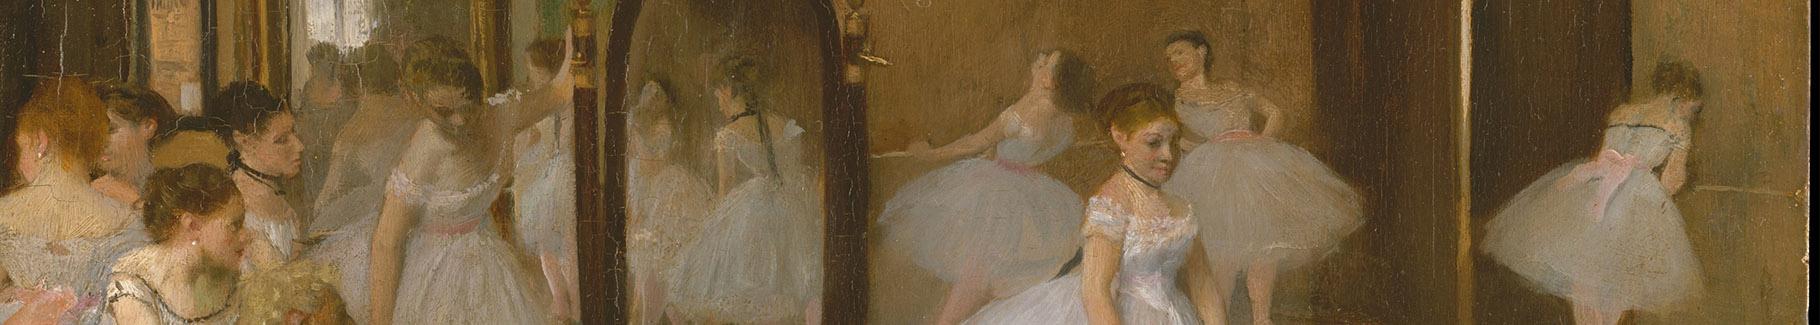 Obraz Klasa tańca